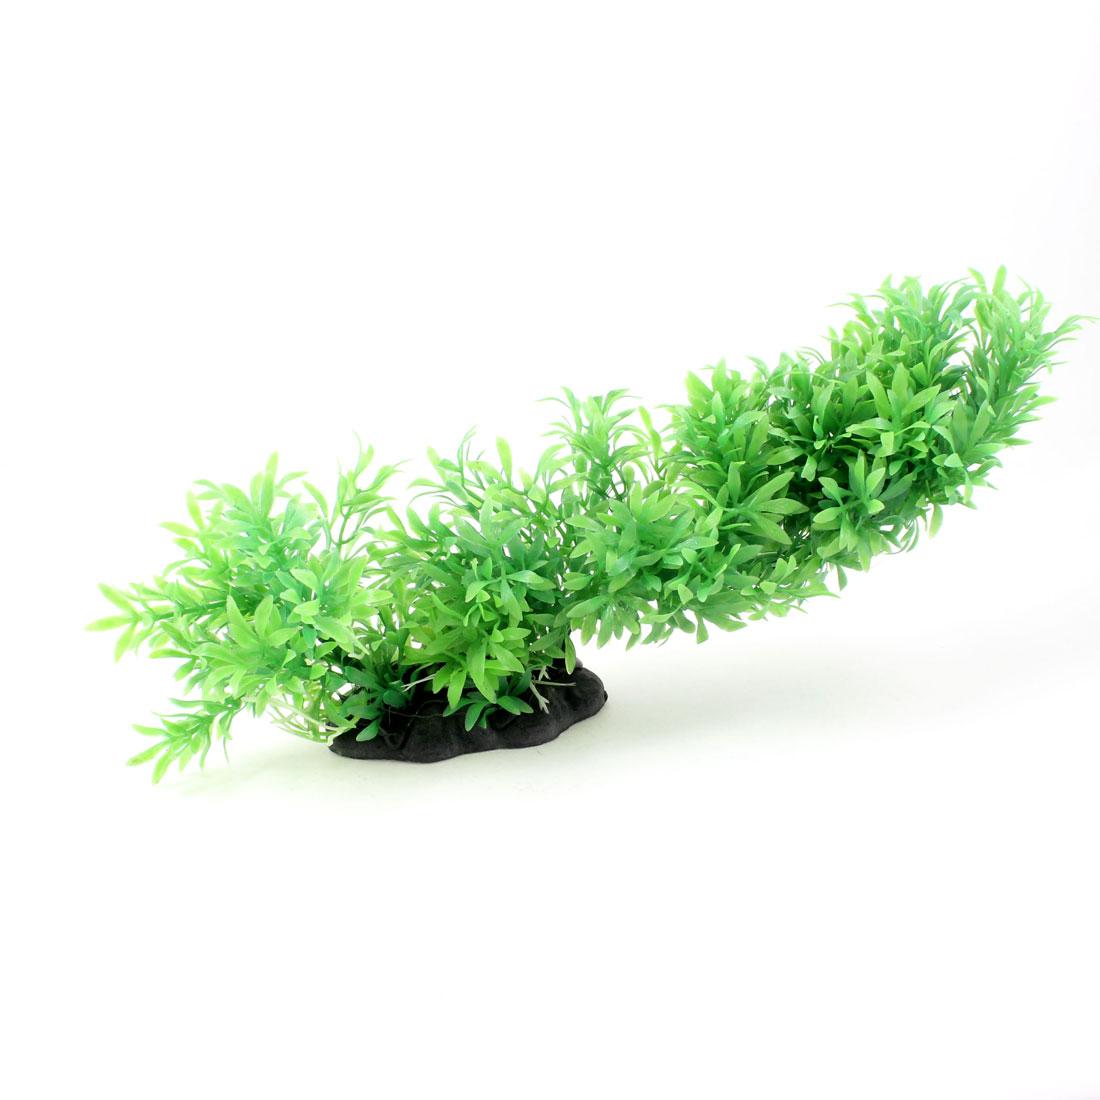 "7.5"" Height Fish Tank Decor Plastic Underwater Grass Plants Green"